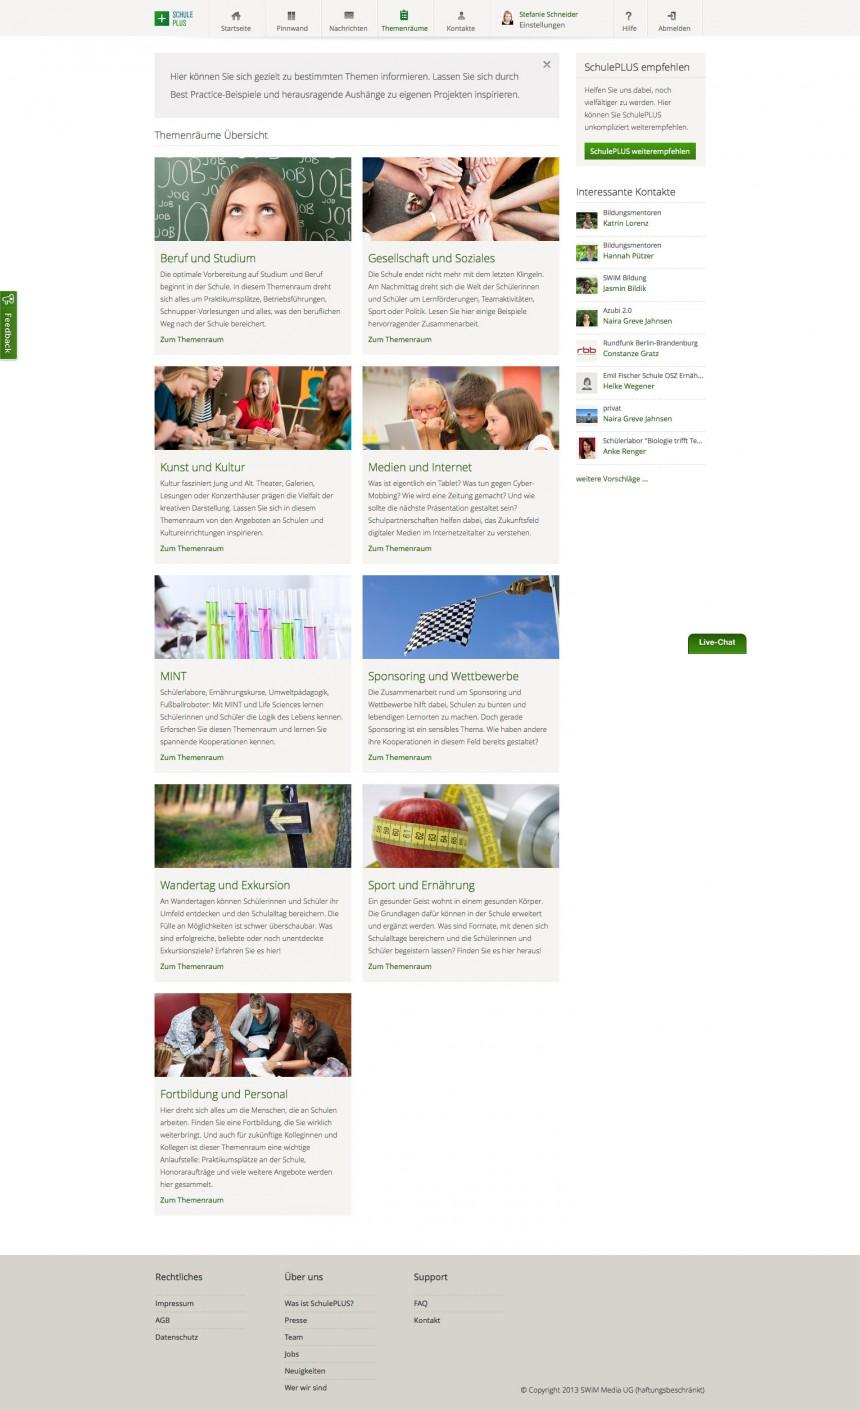 SchulePlus - fields of topics